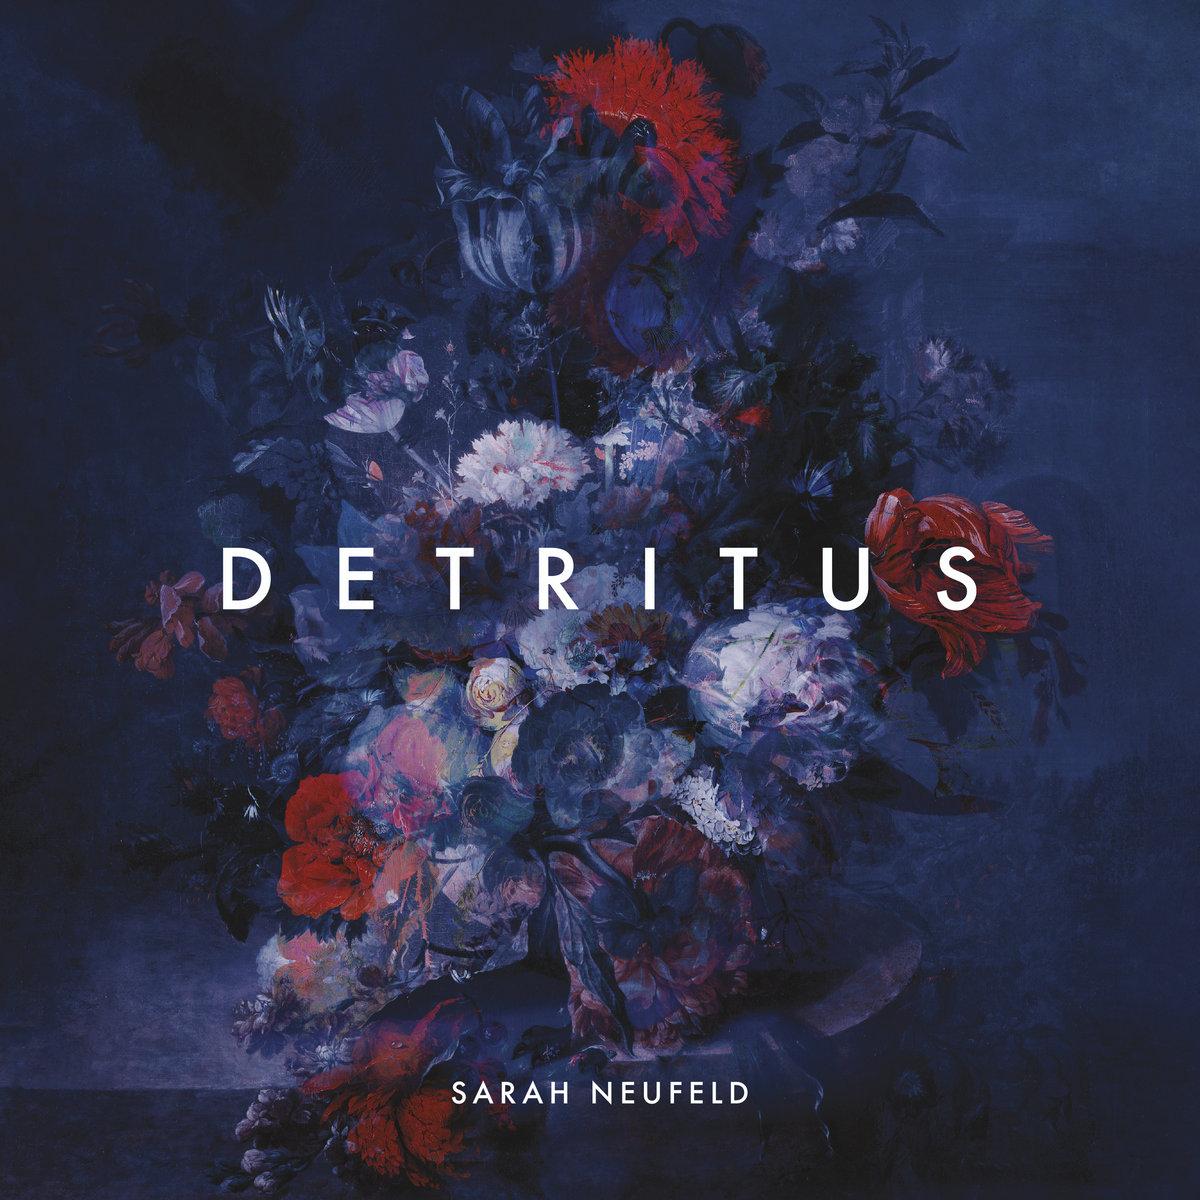 Sarah Neufeld – Detritus